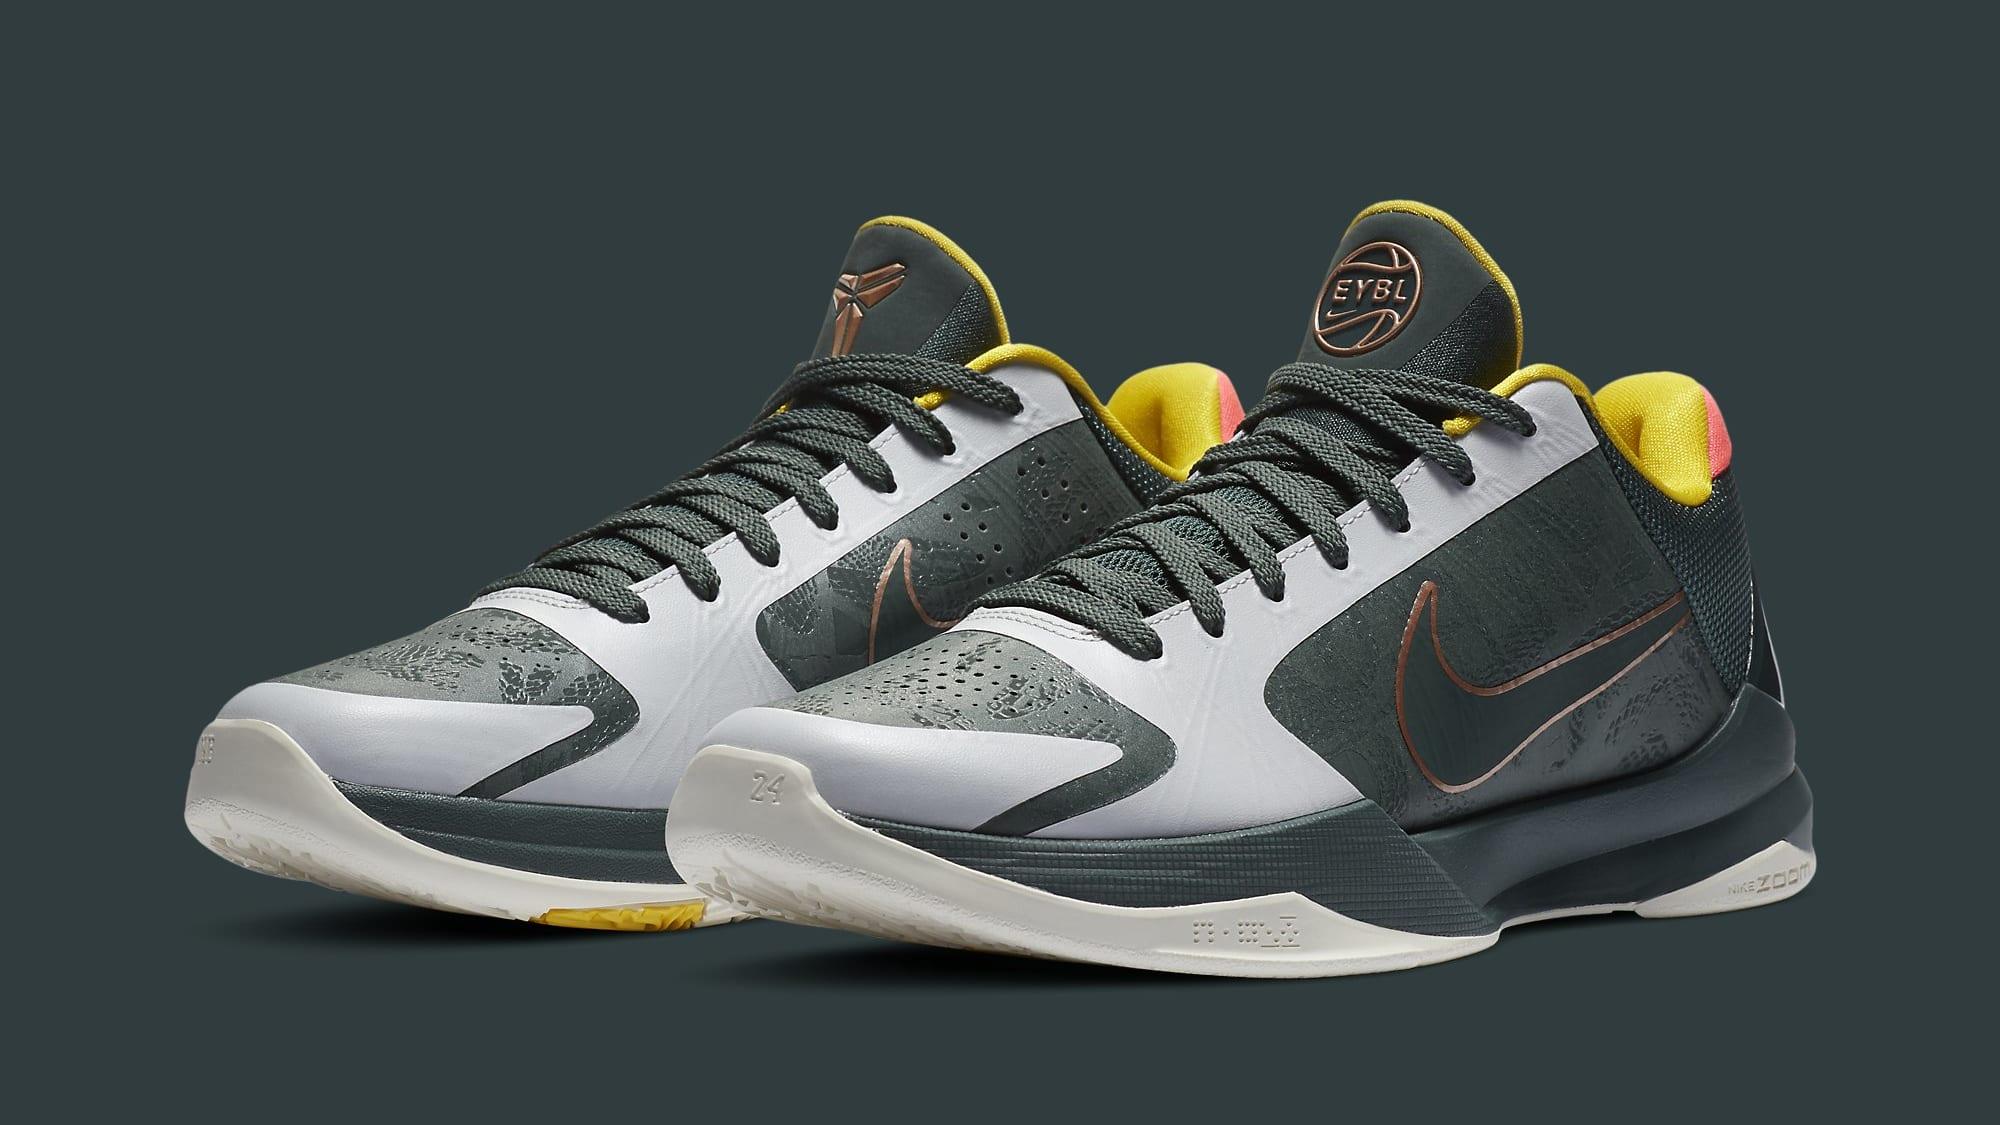 Nike Kobe 5 Protro 'EYBL' CD4991-300 Pair